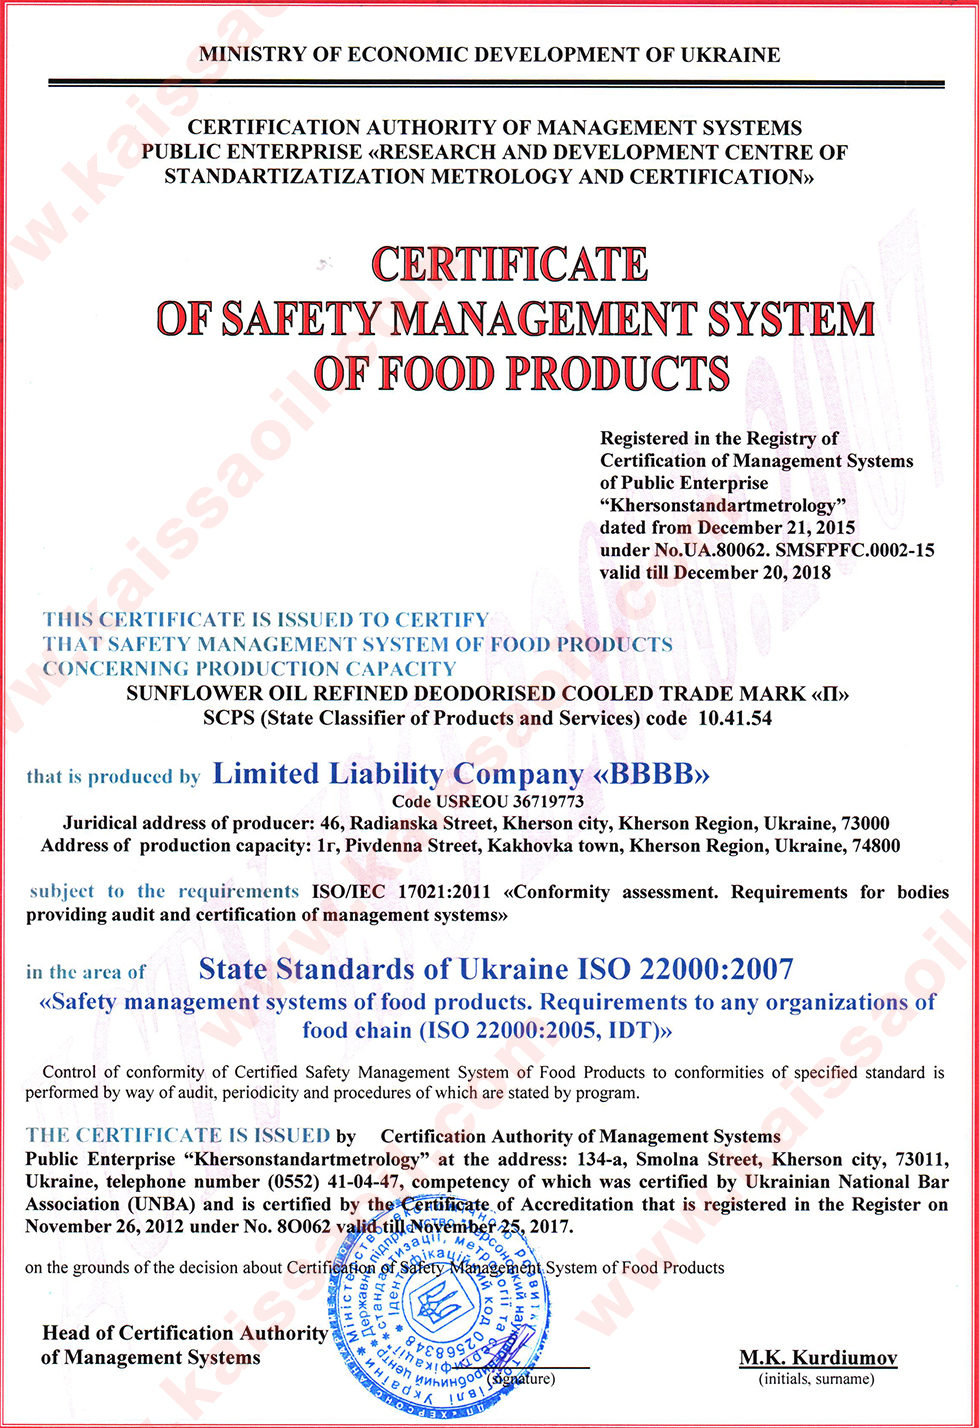 Сертификат ХАСП